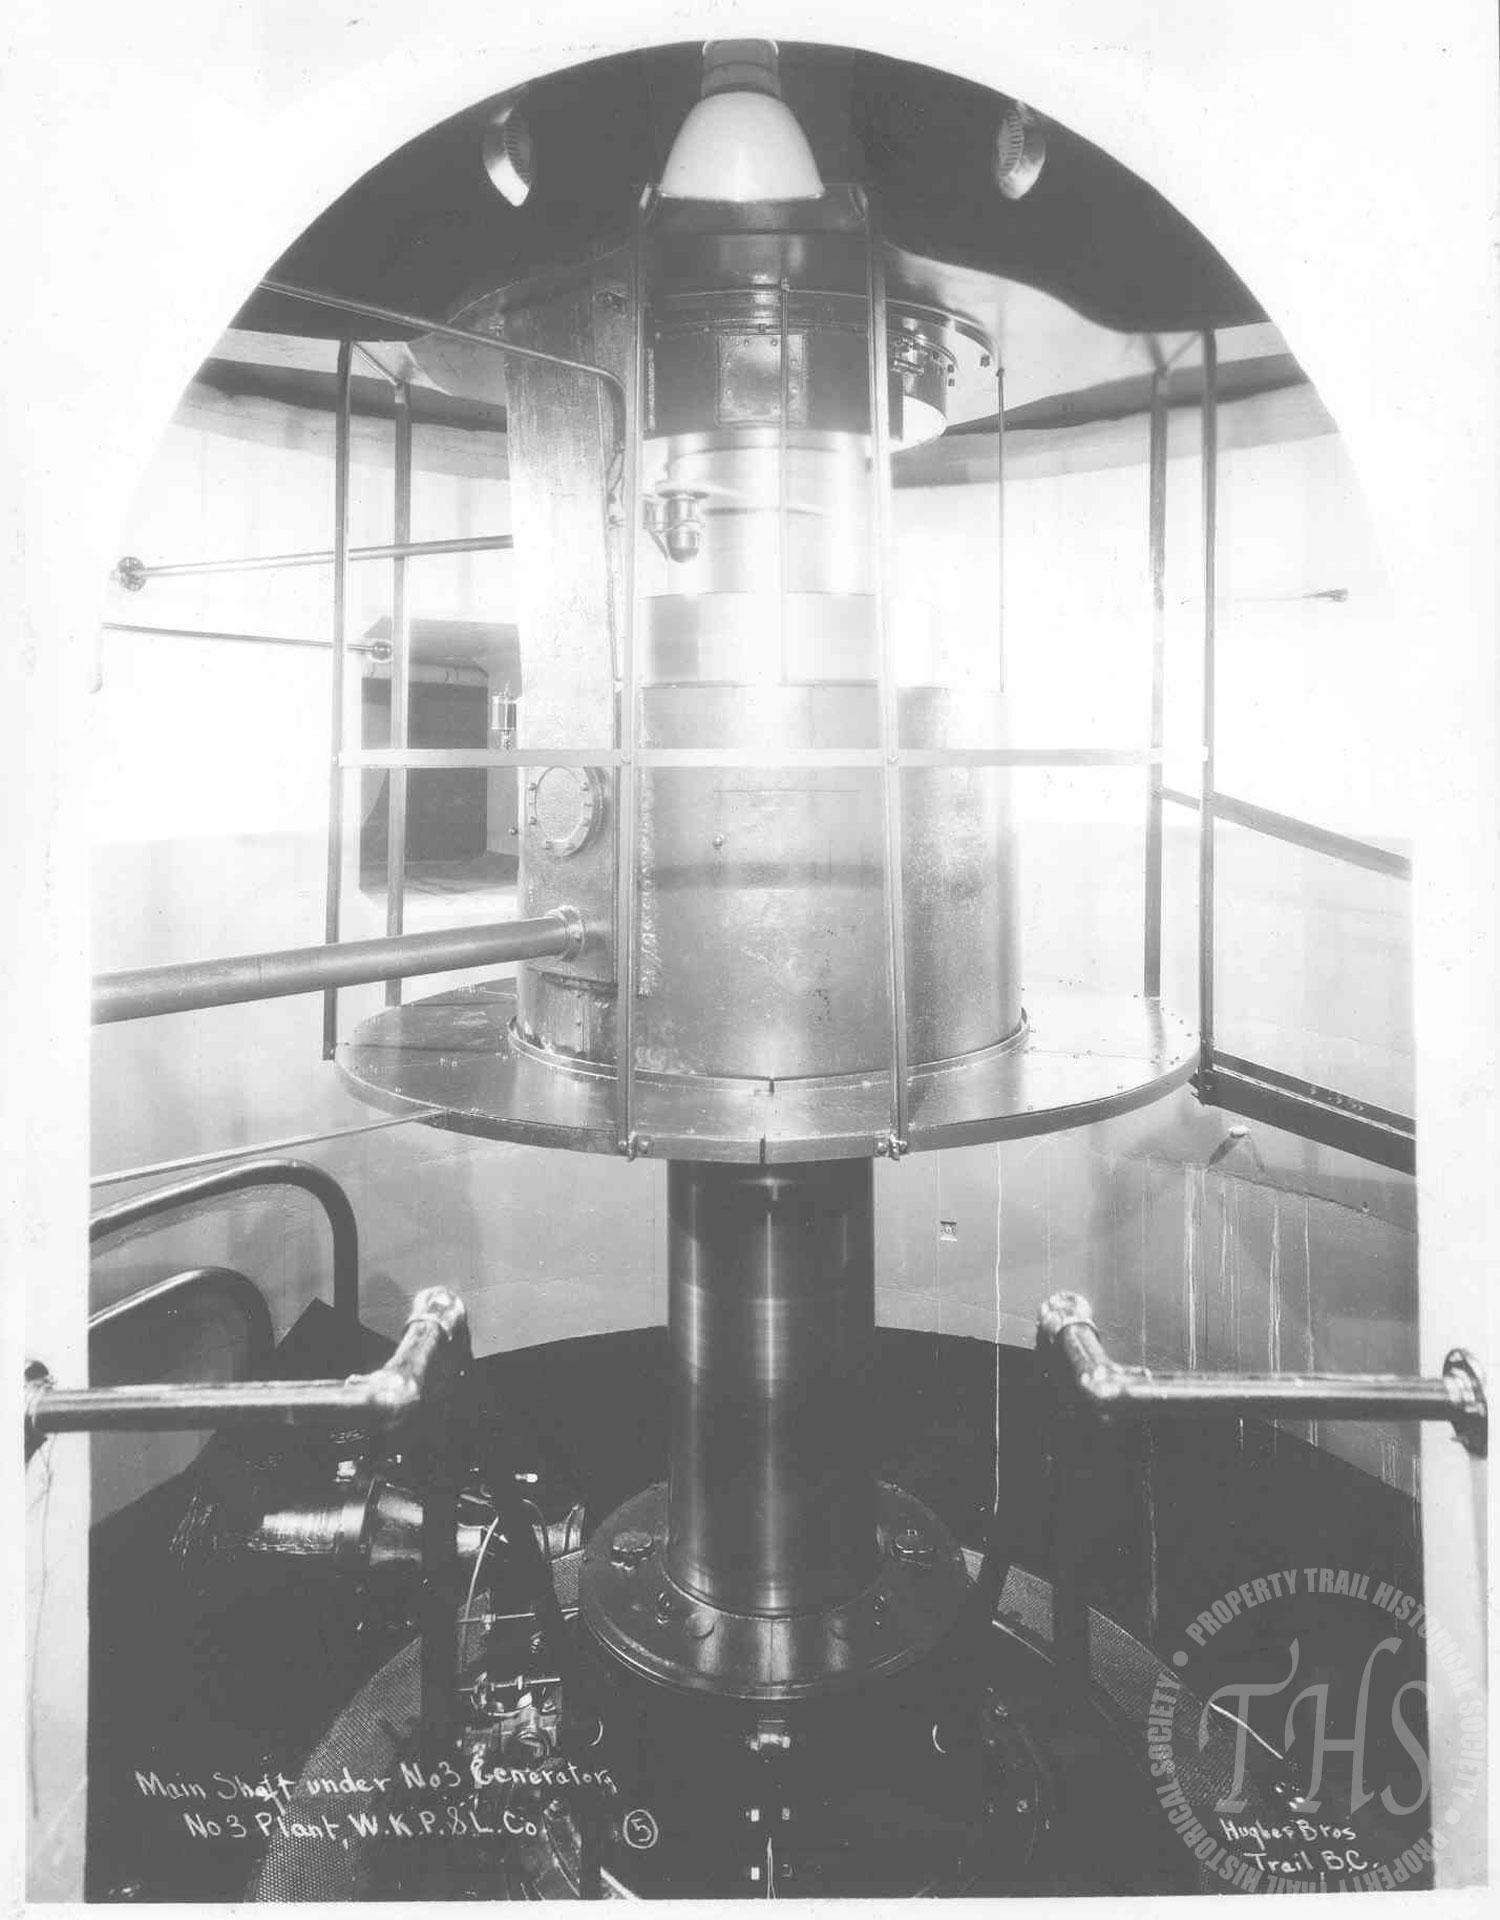 Main shaft under #3 generator, South Slocan plant (Hughes) - 1930